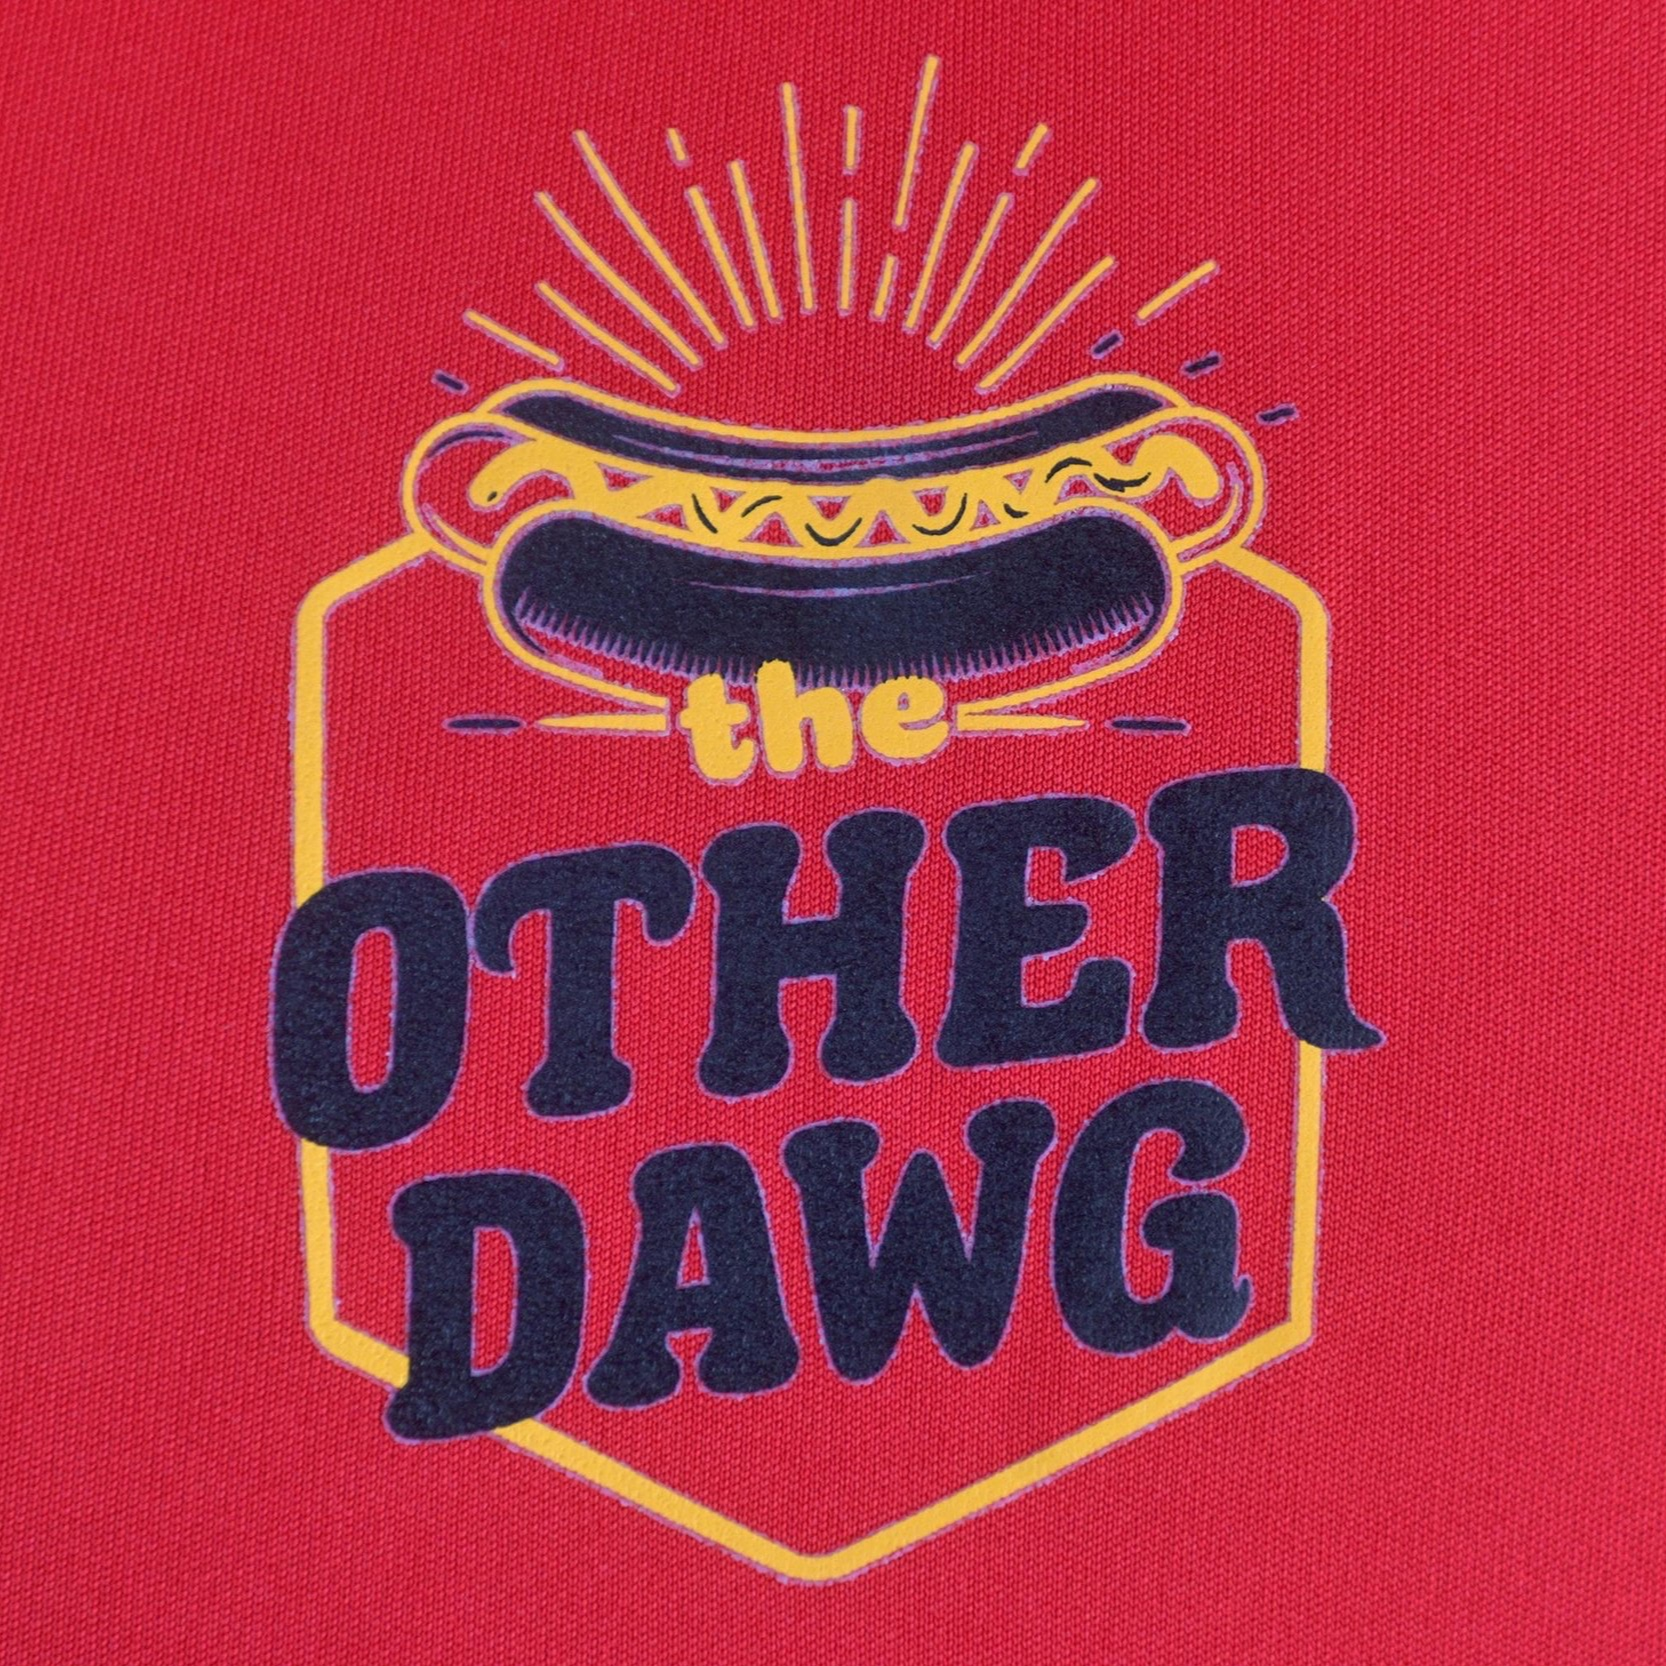 TheOtherDawg.jpg